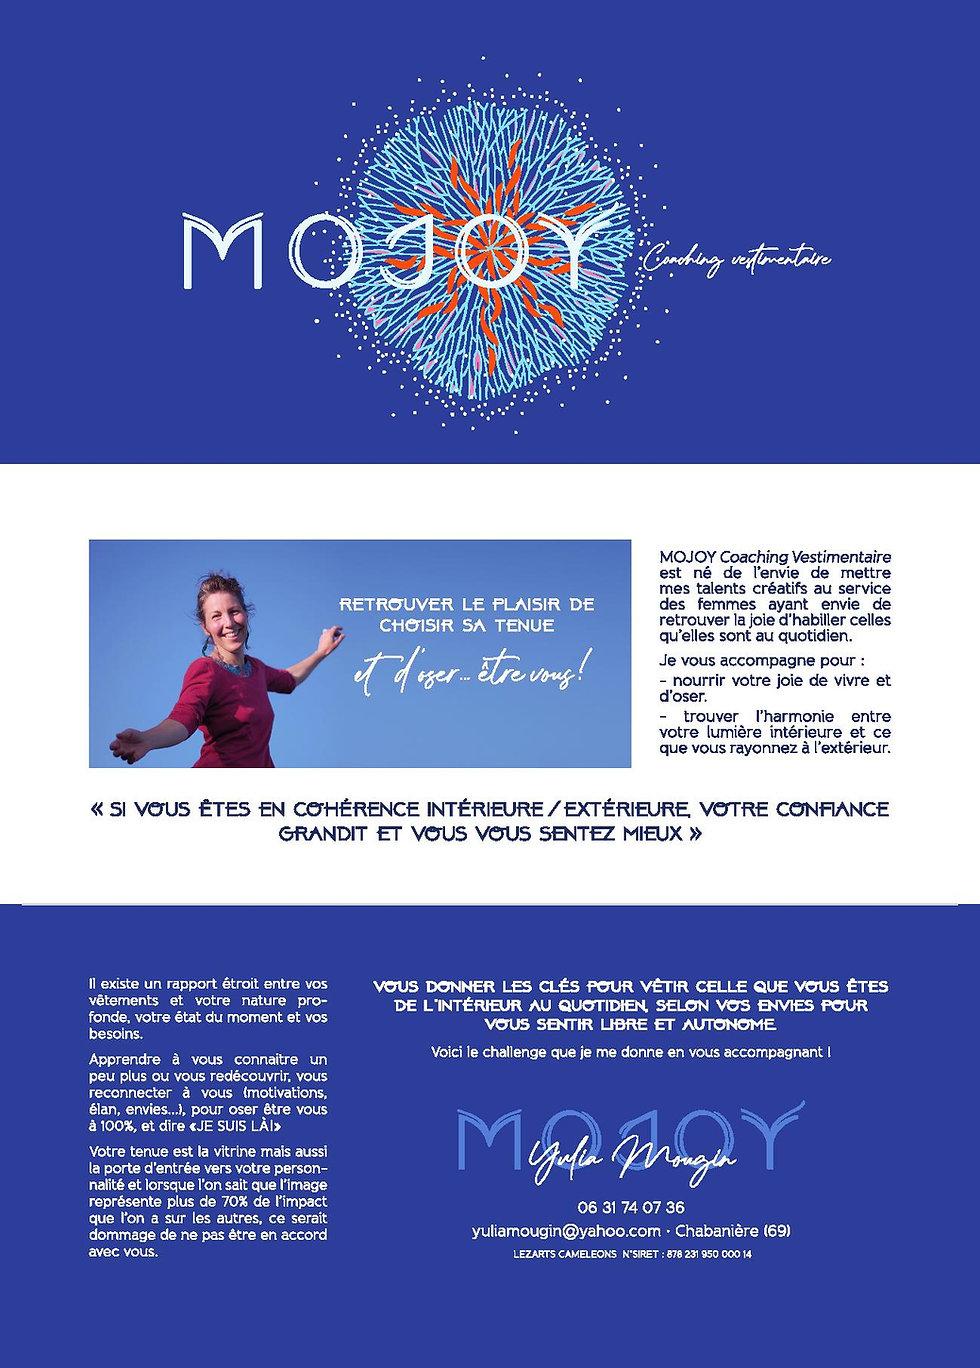 Brochure 2 Mojoy A4 3 volets 5mm fond pe